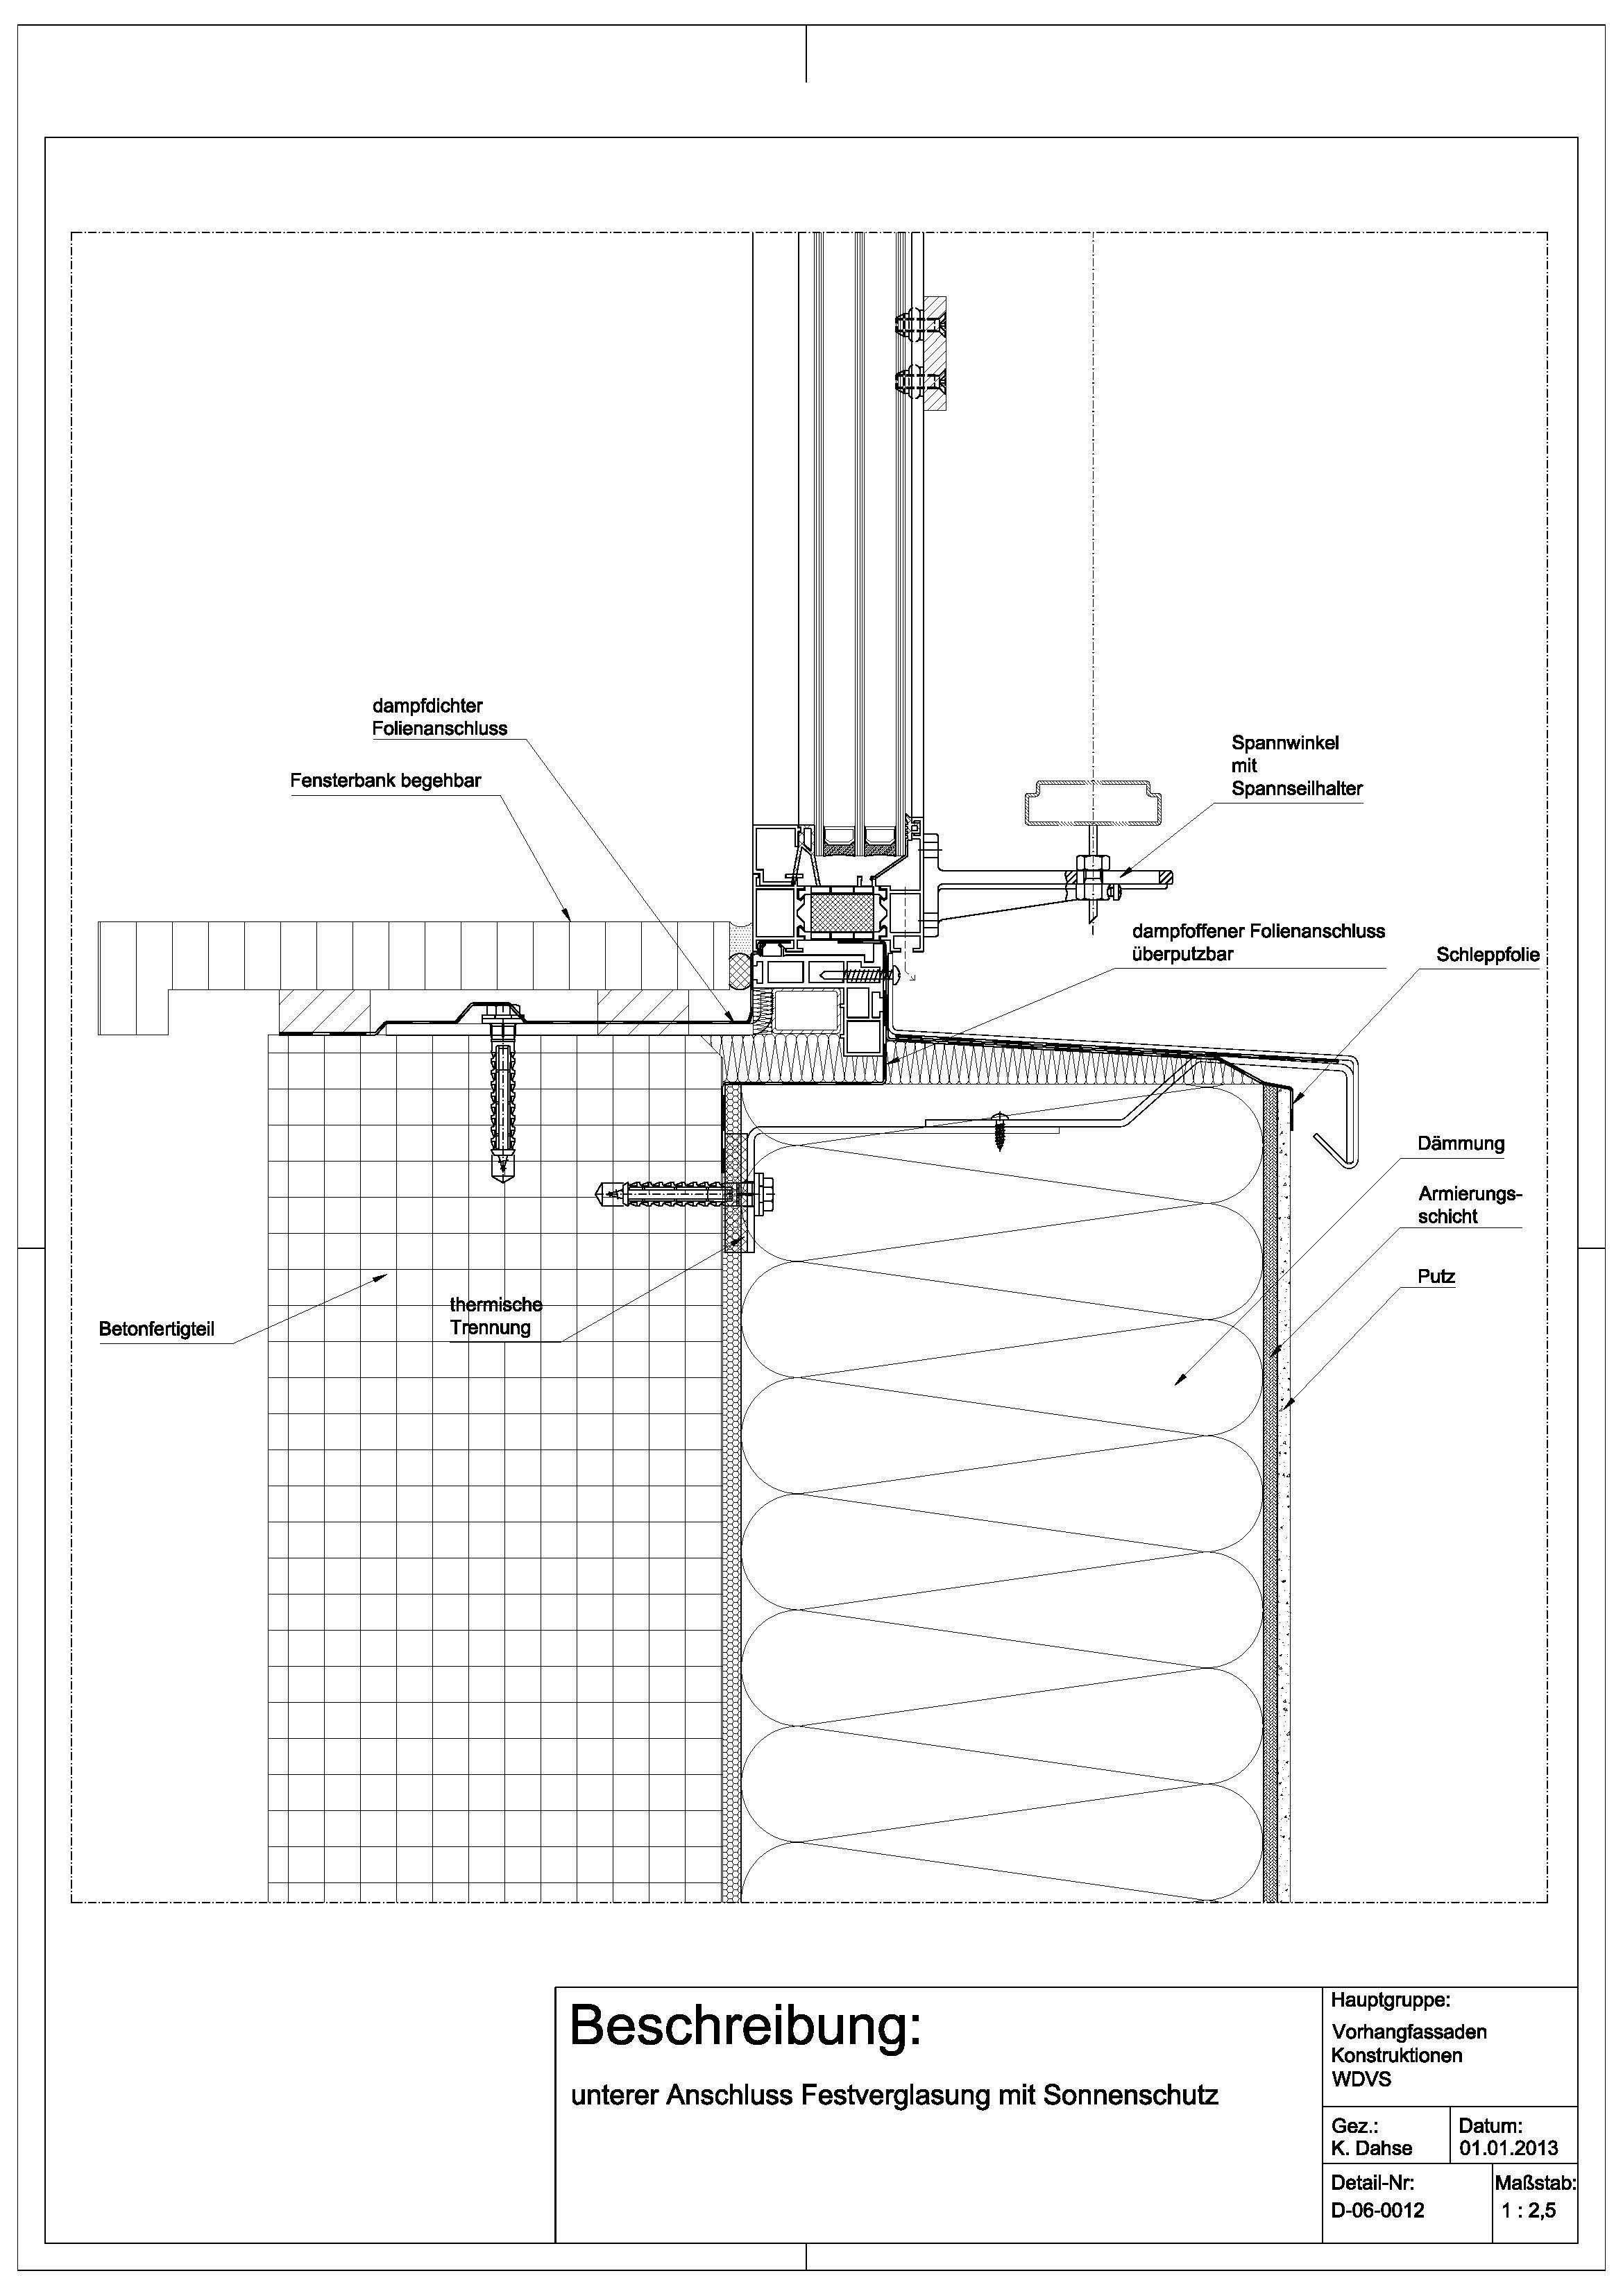 d 06 0012 unterer anschluss festverglasung mit sonnenschutz architectural drawings models. Black Bedroom Furniture Sets. Home Design Ideas